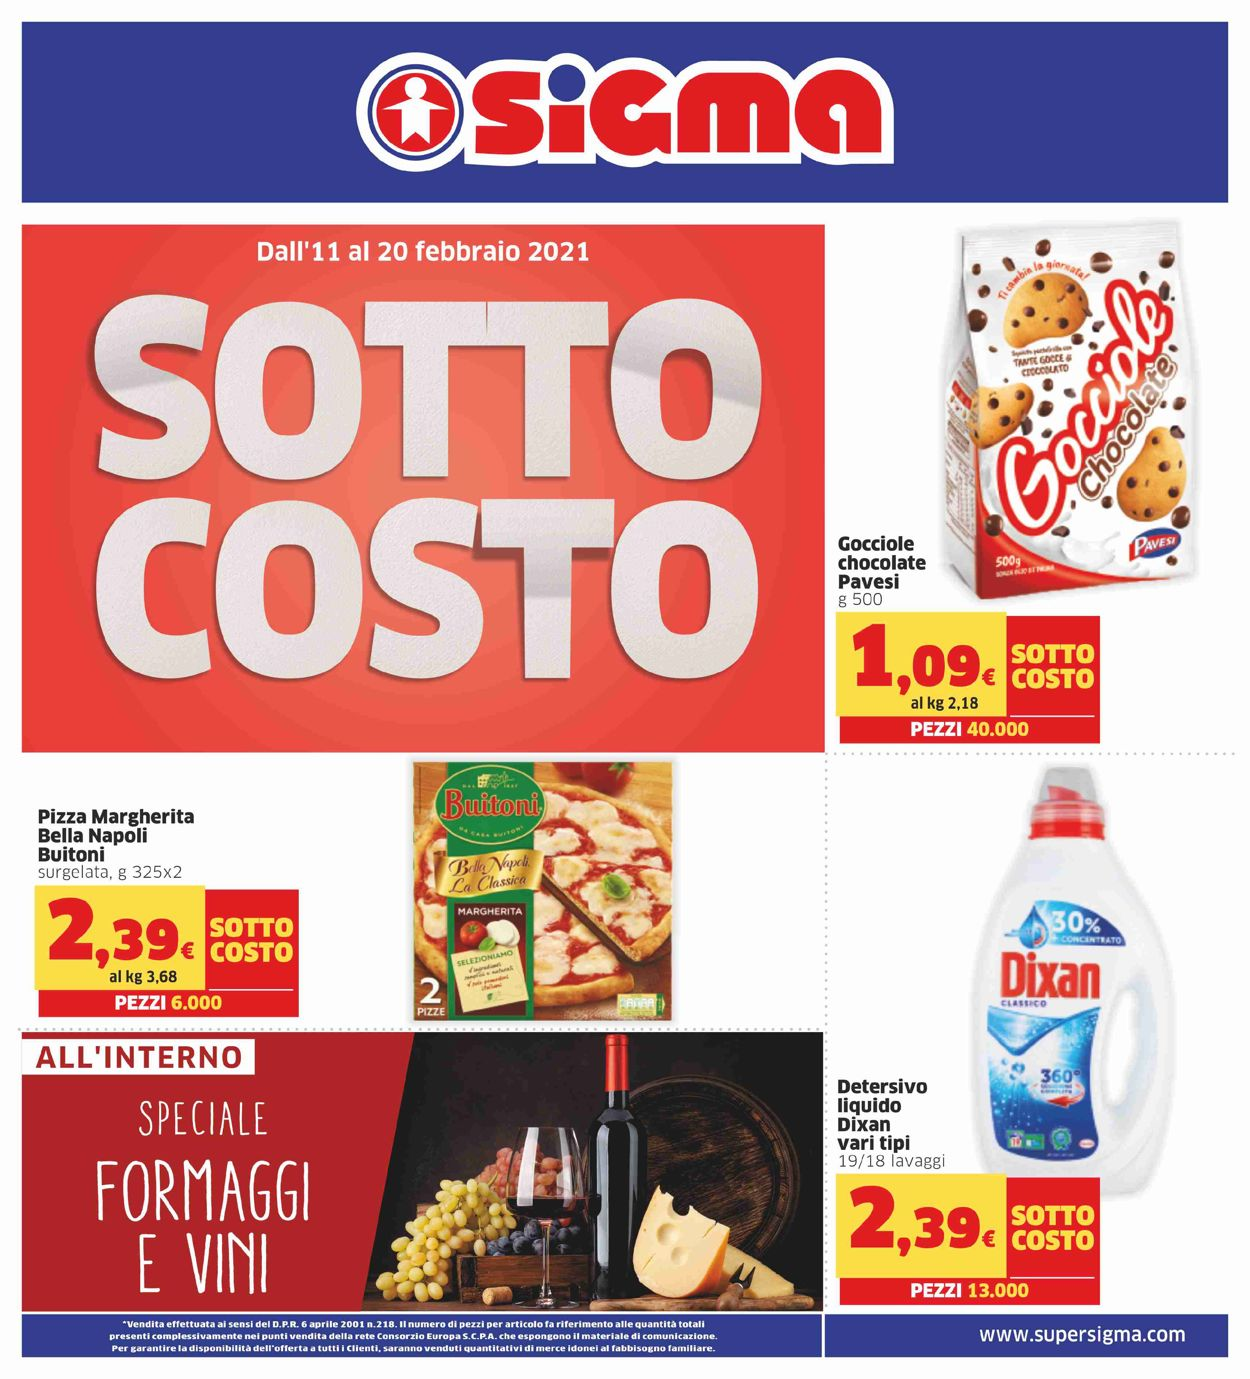 Volantino Sigma - Offerte 11/02-20/02/2021